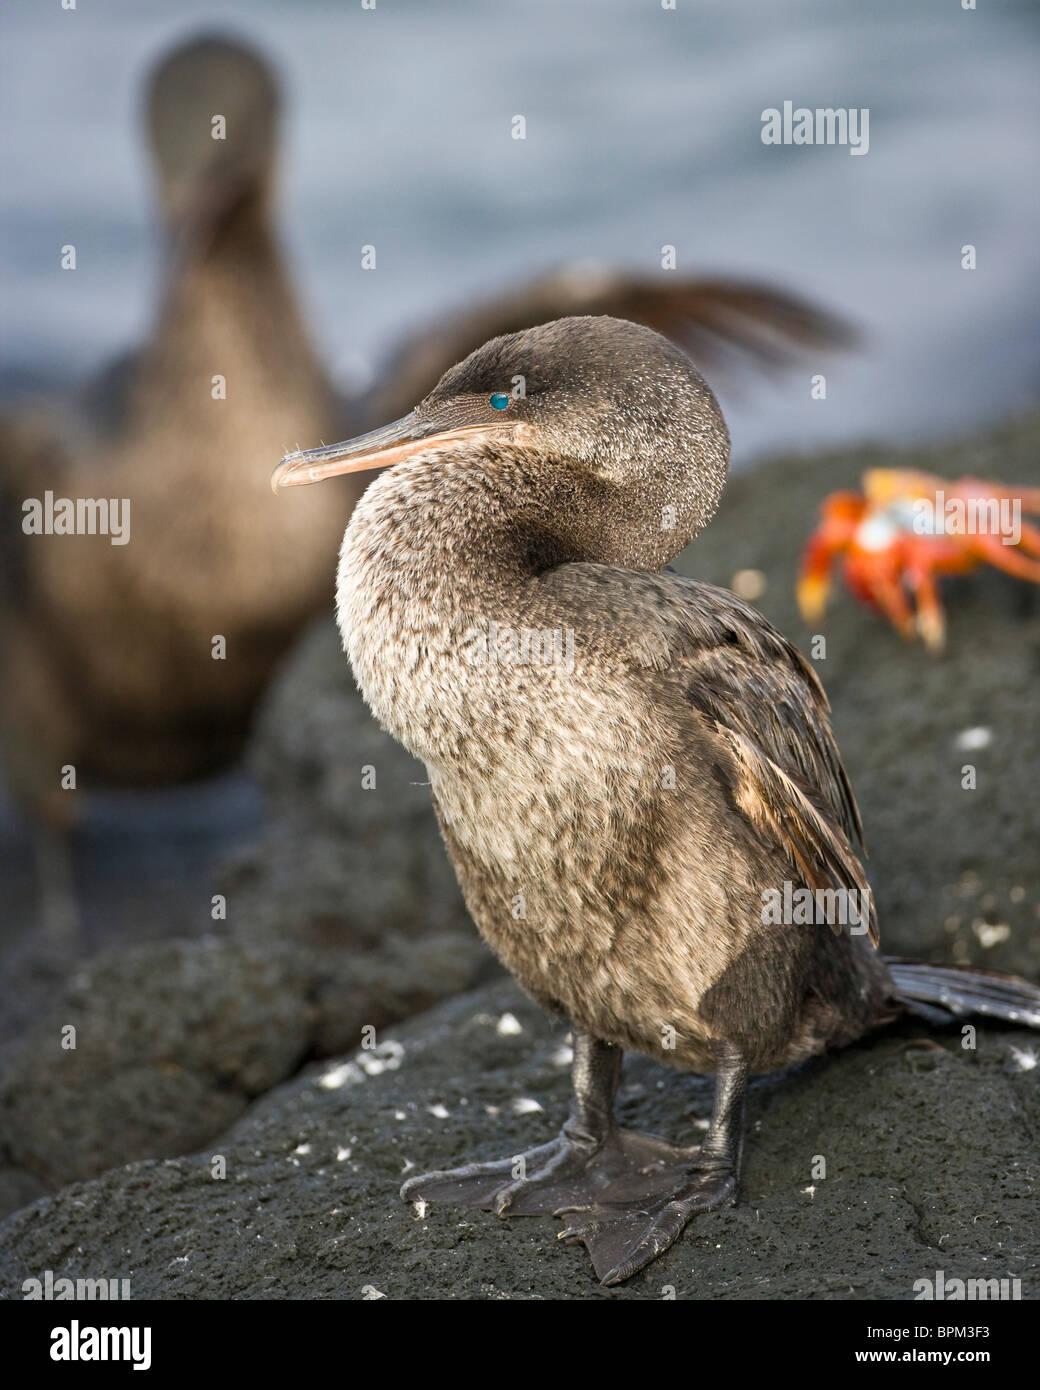 Ecuador. Flightless Cormorant on Fernanadina Island in the Galapagos. - Stock Image